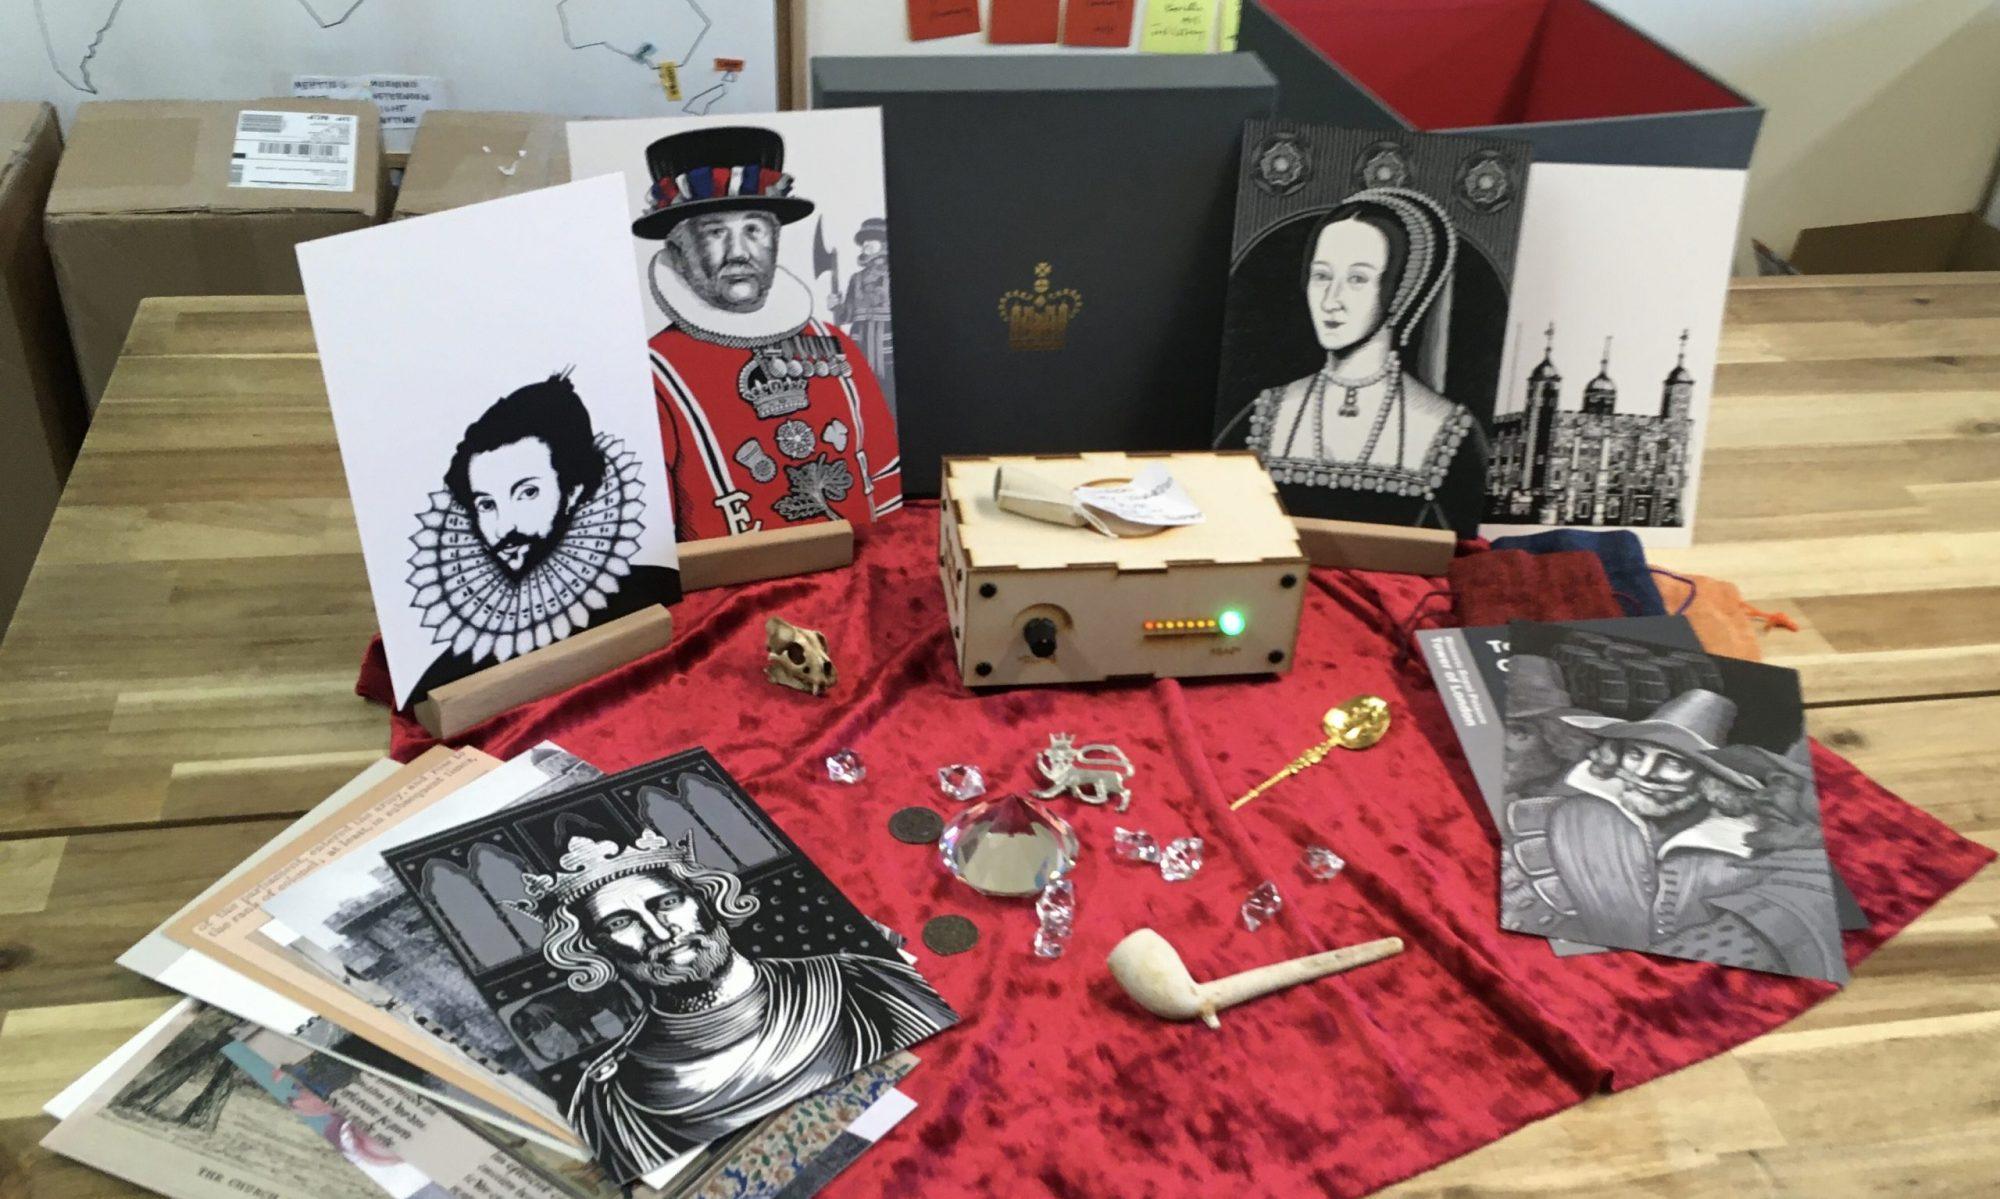 Museum in a Box